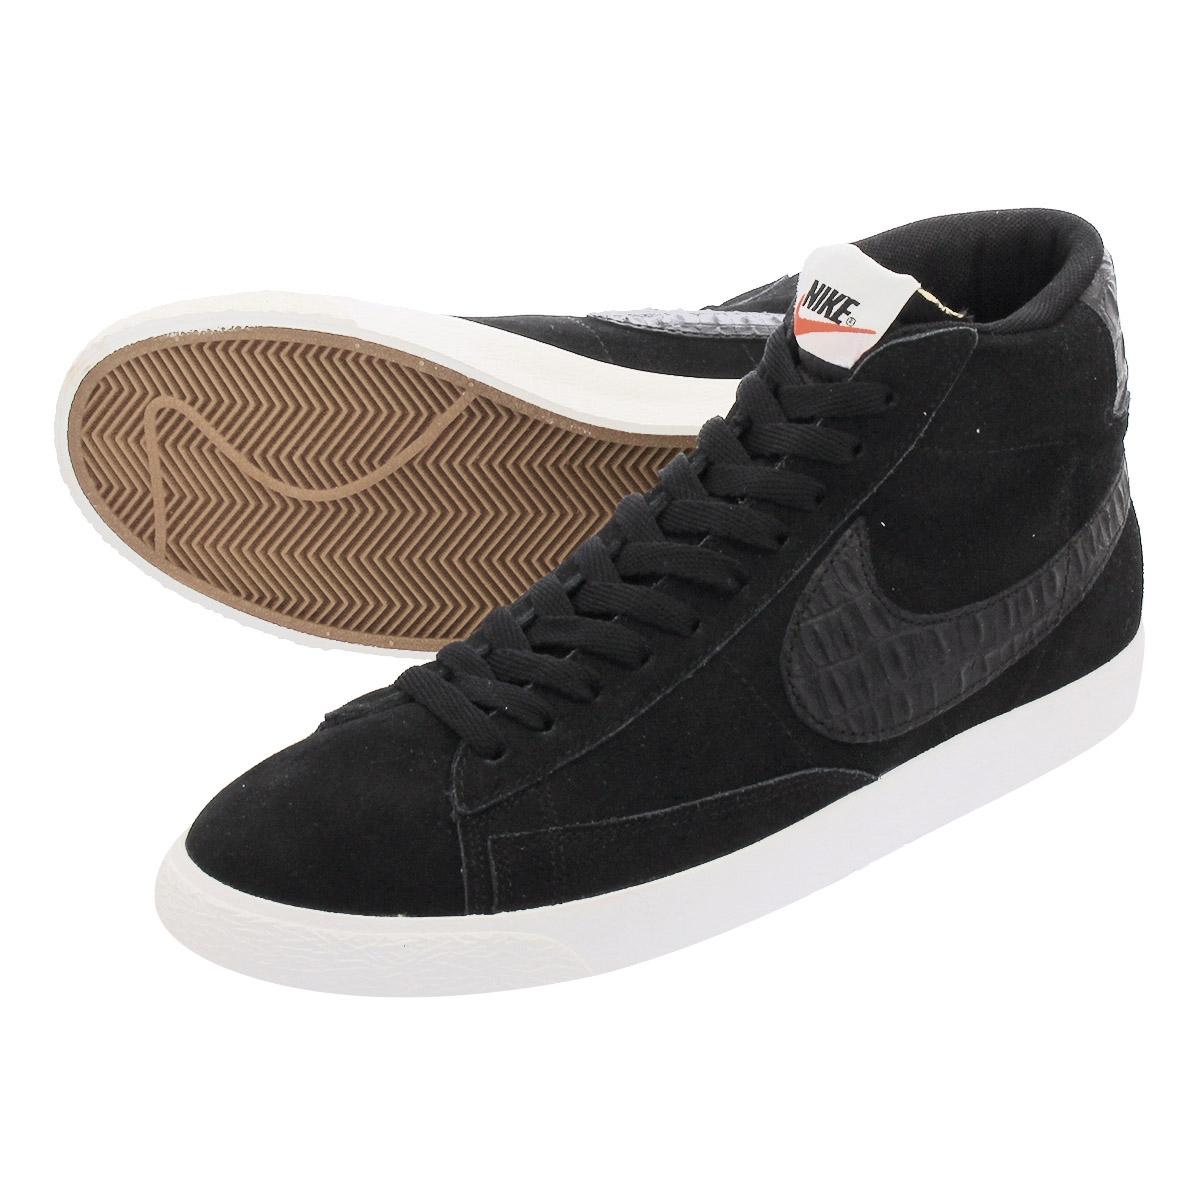 new product 04864 fd422 NIKE BLAZER MID PRM VNTG Nike blazer mid premium vintage BLACK BLACK SAIL  638,261 ...